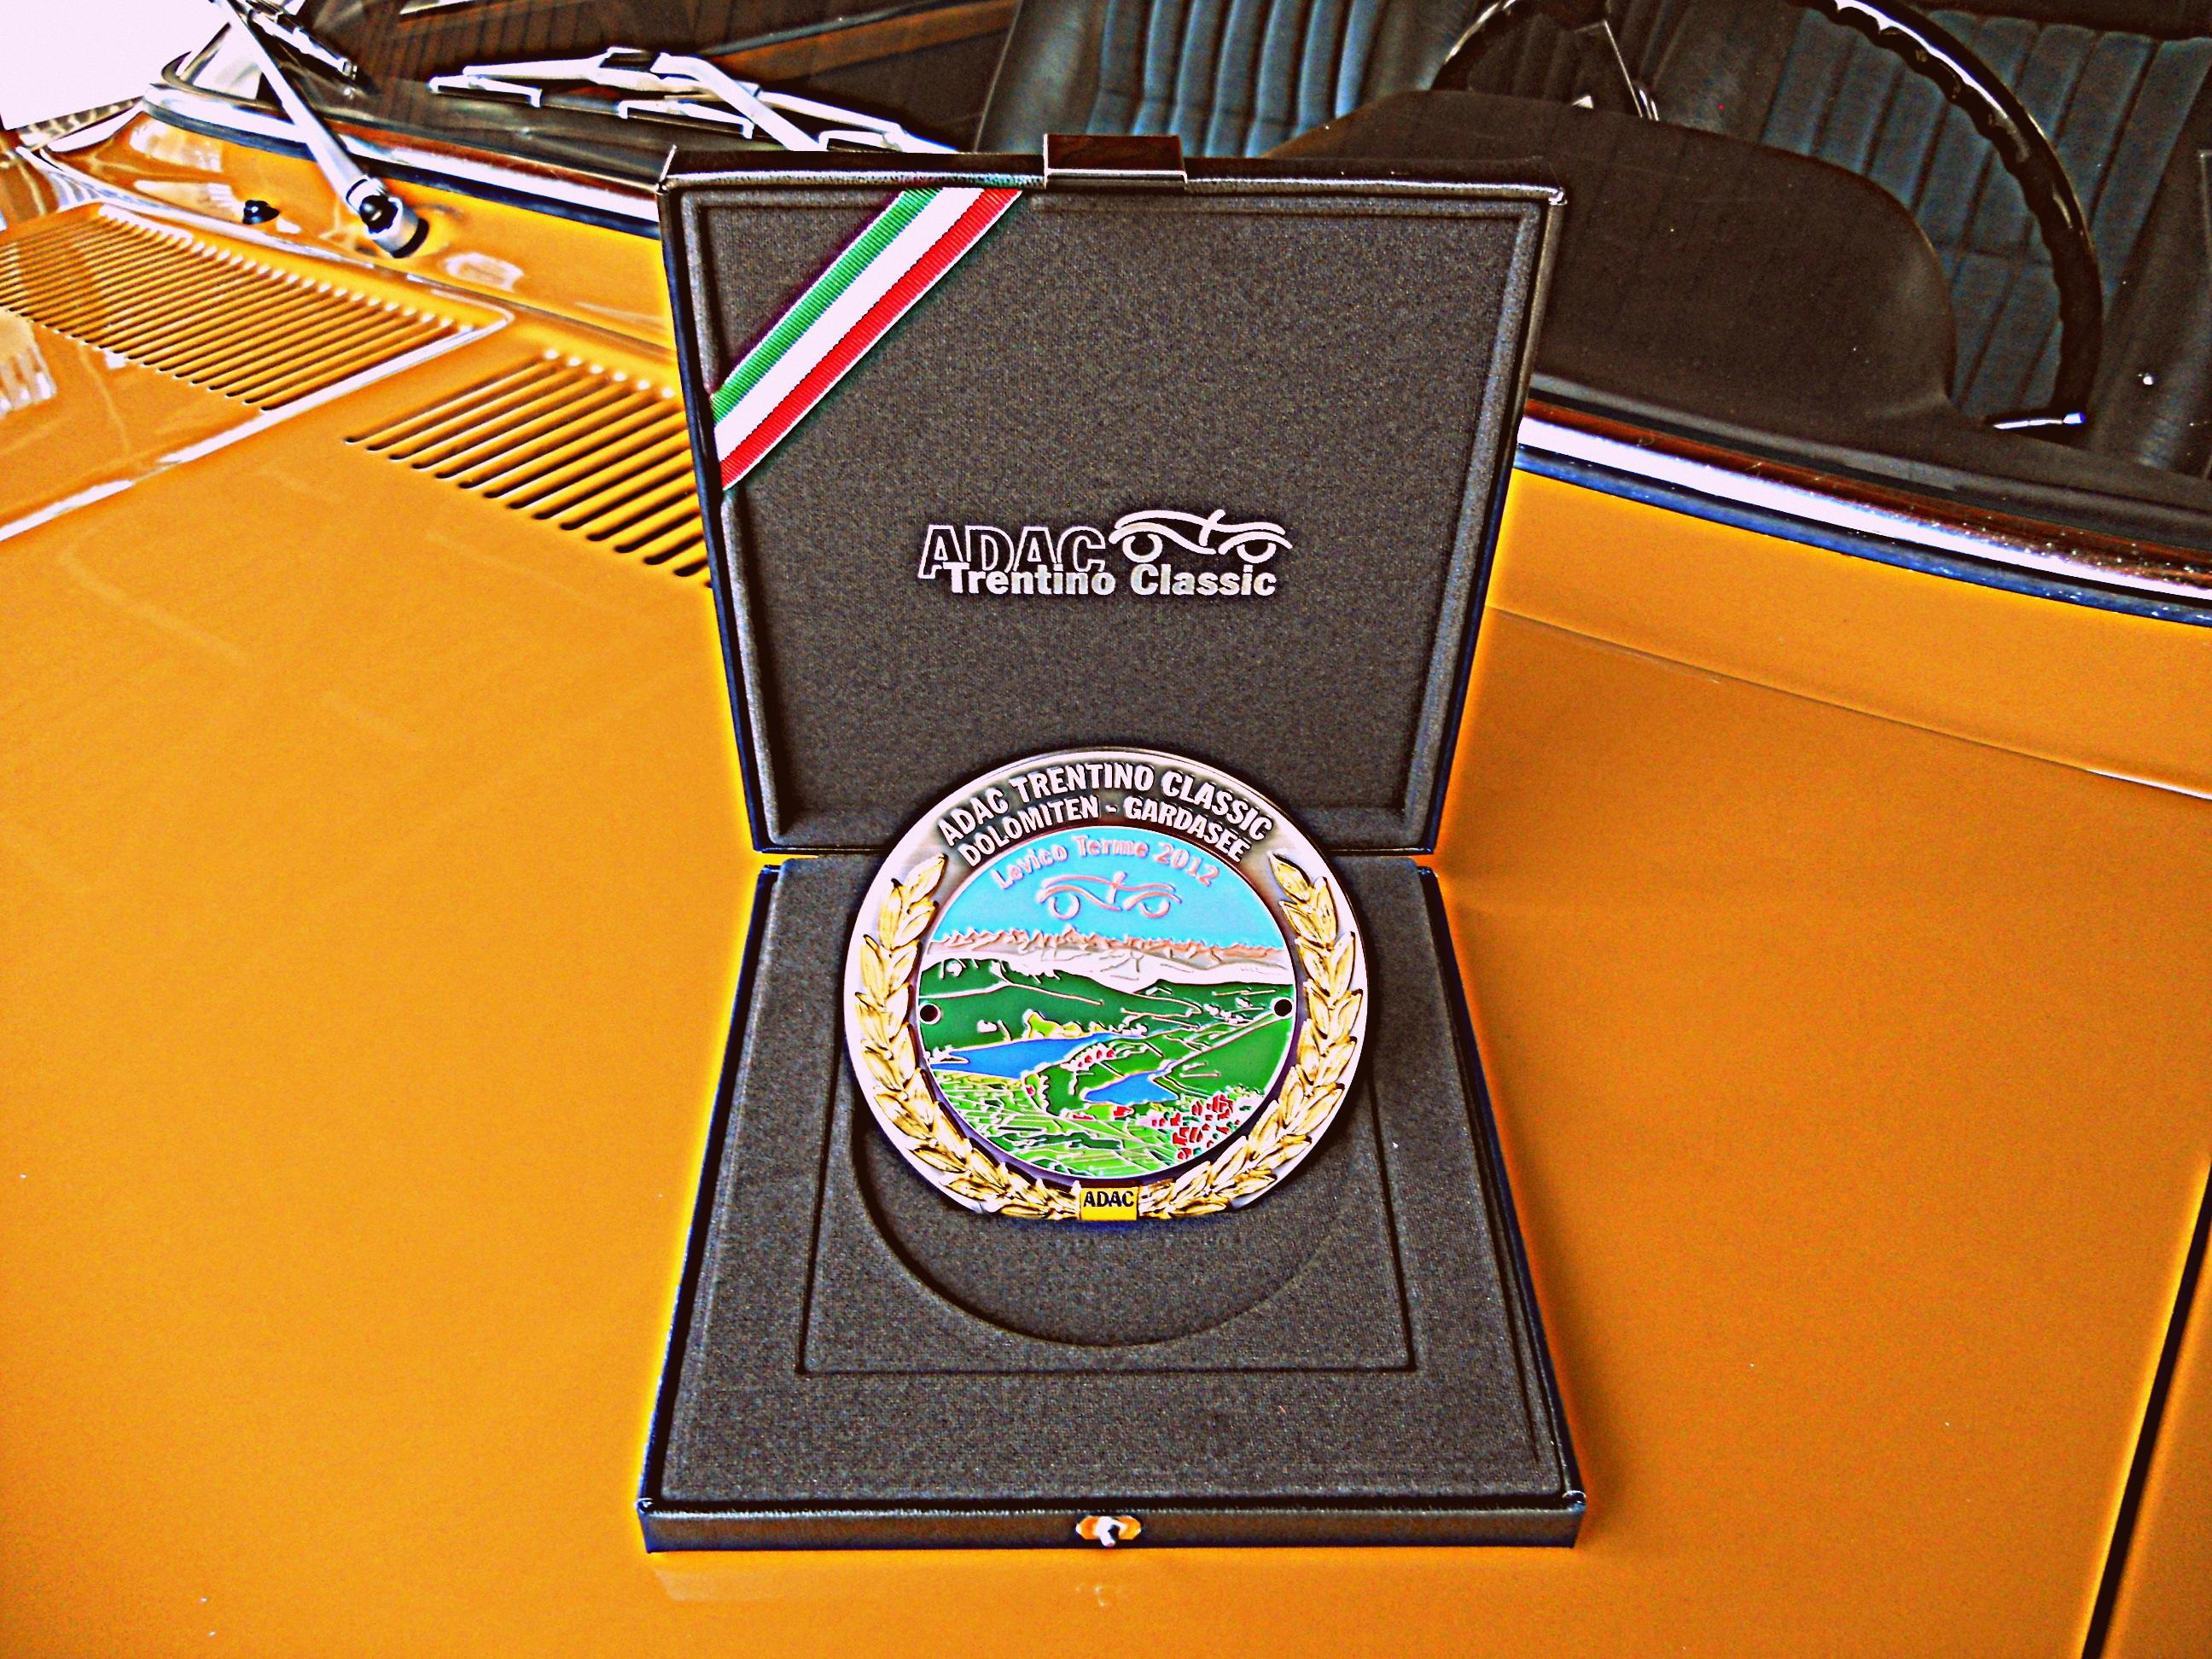 ADAC Trentino Classic 2012 – AMERICAN EXPRESS Pokal